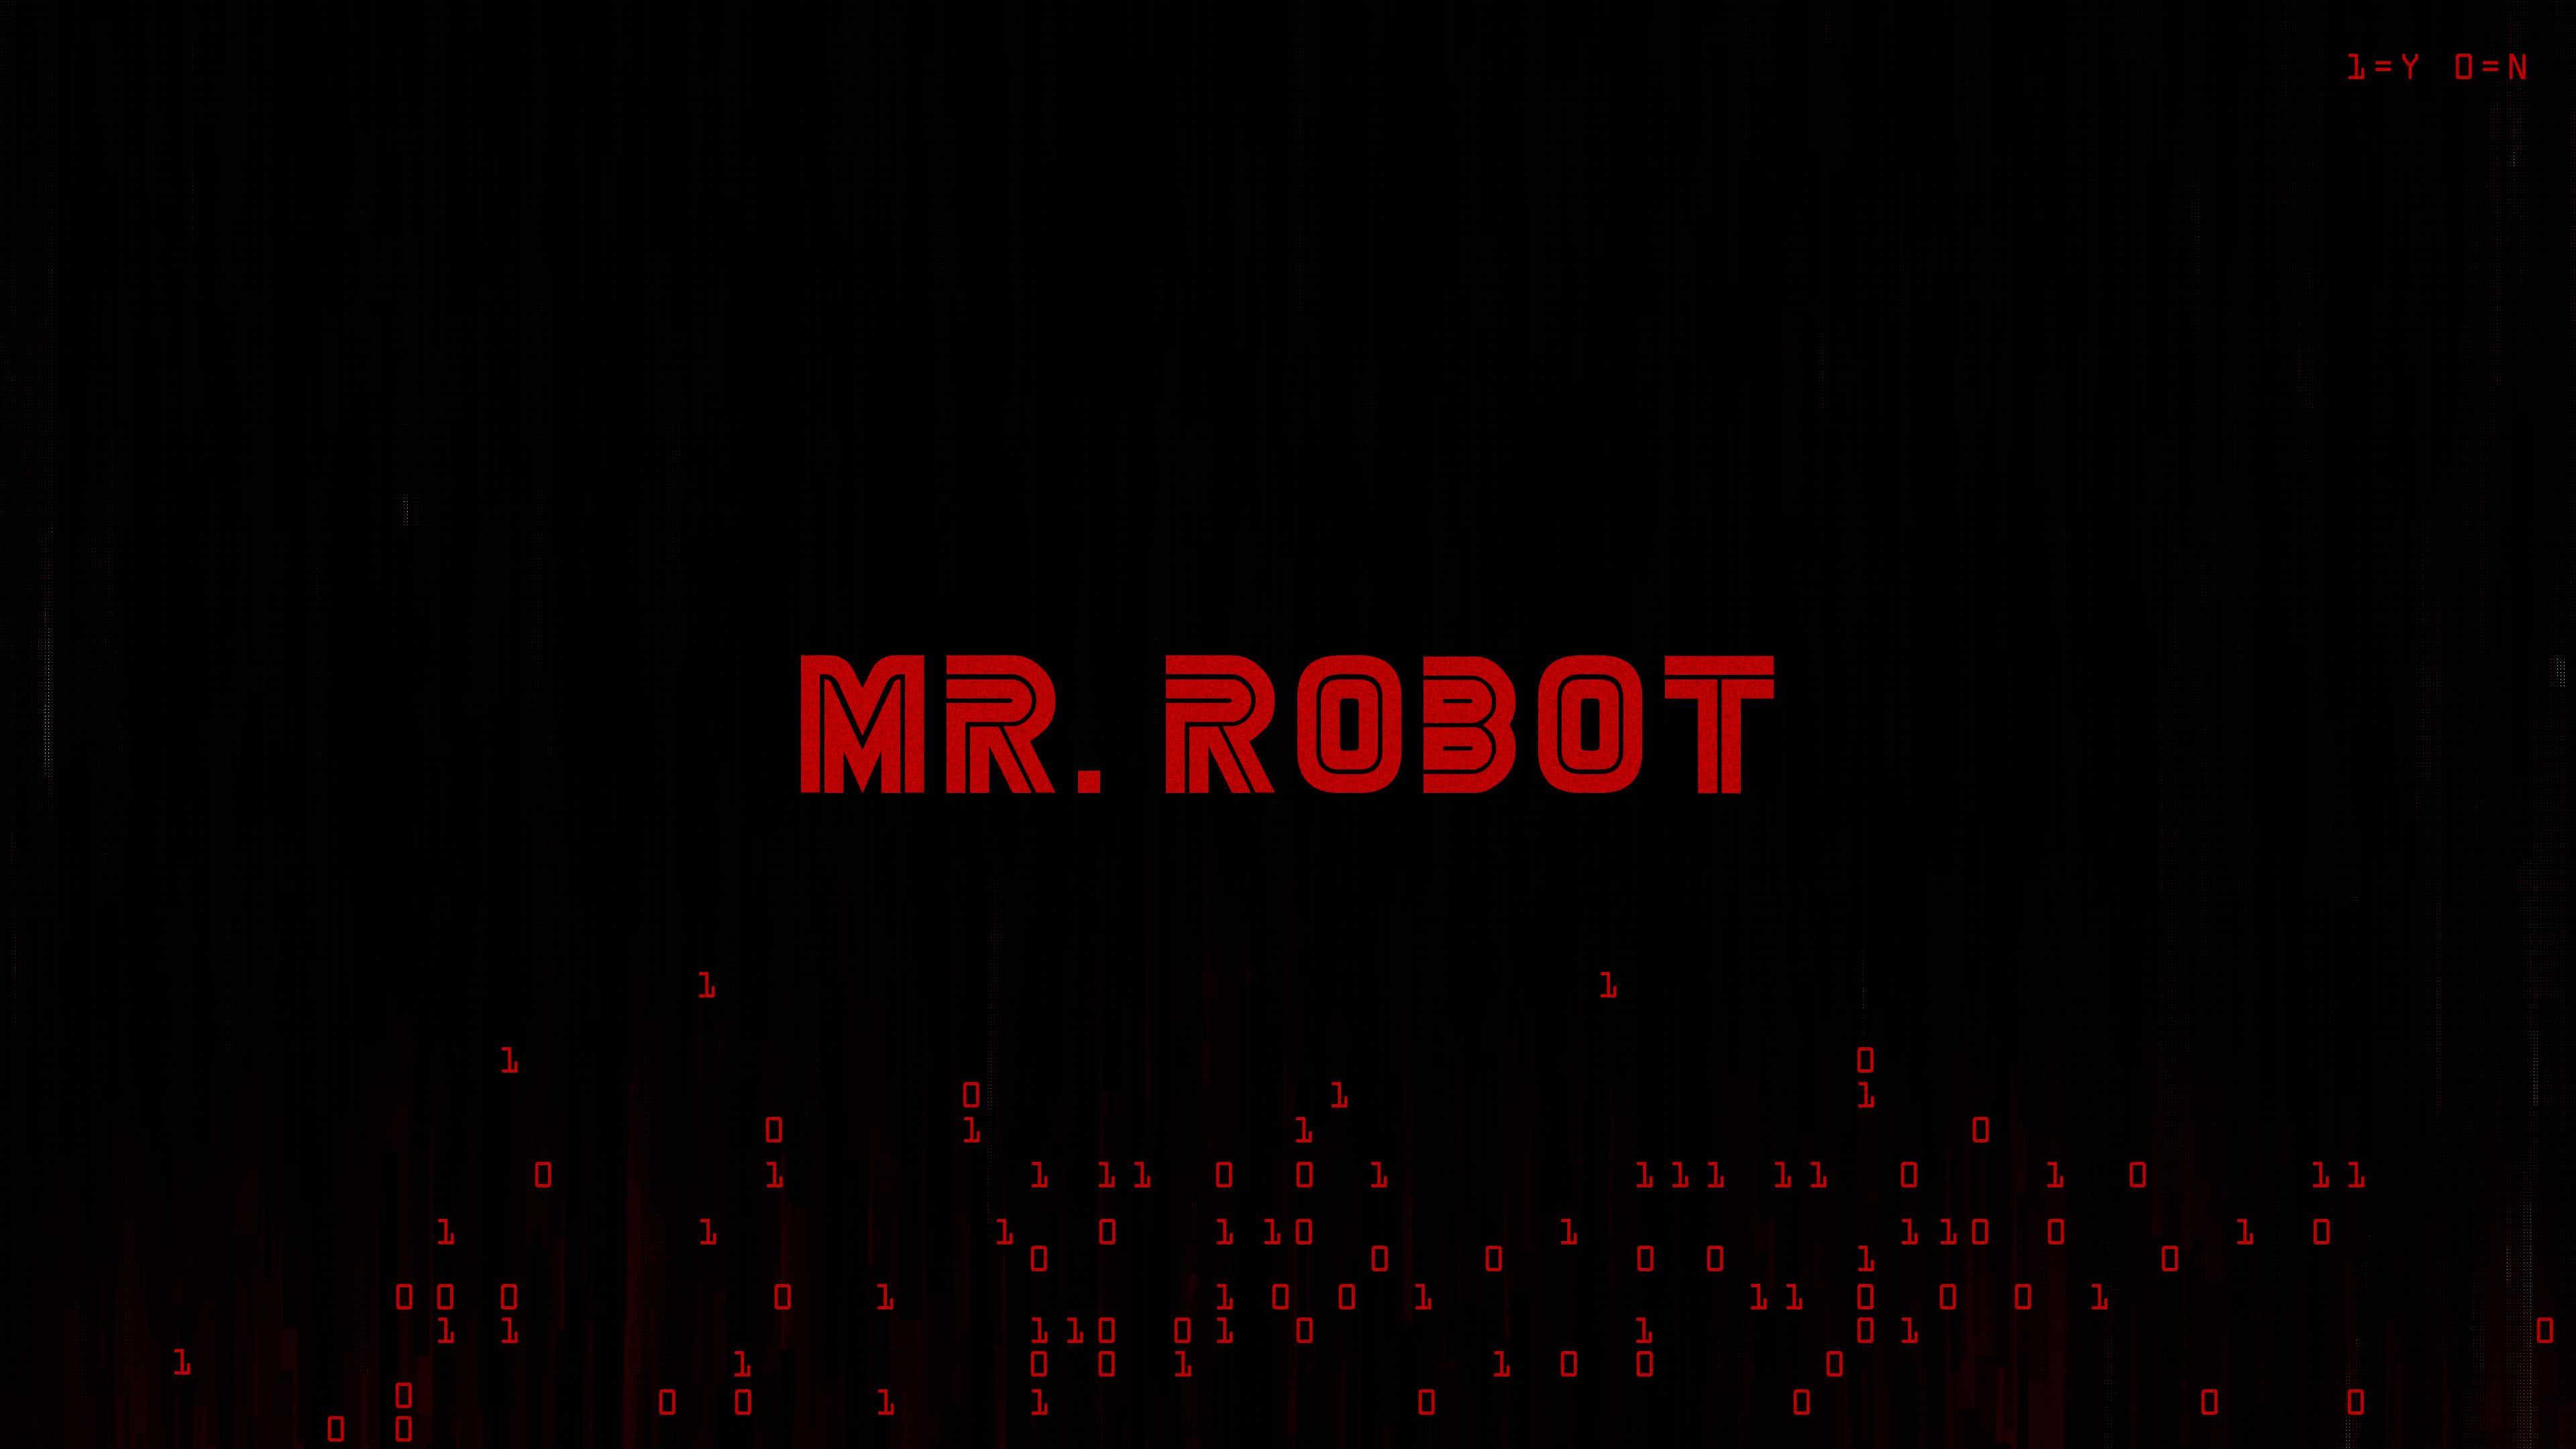 mr robot logo uhd 4k wallpaper